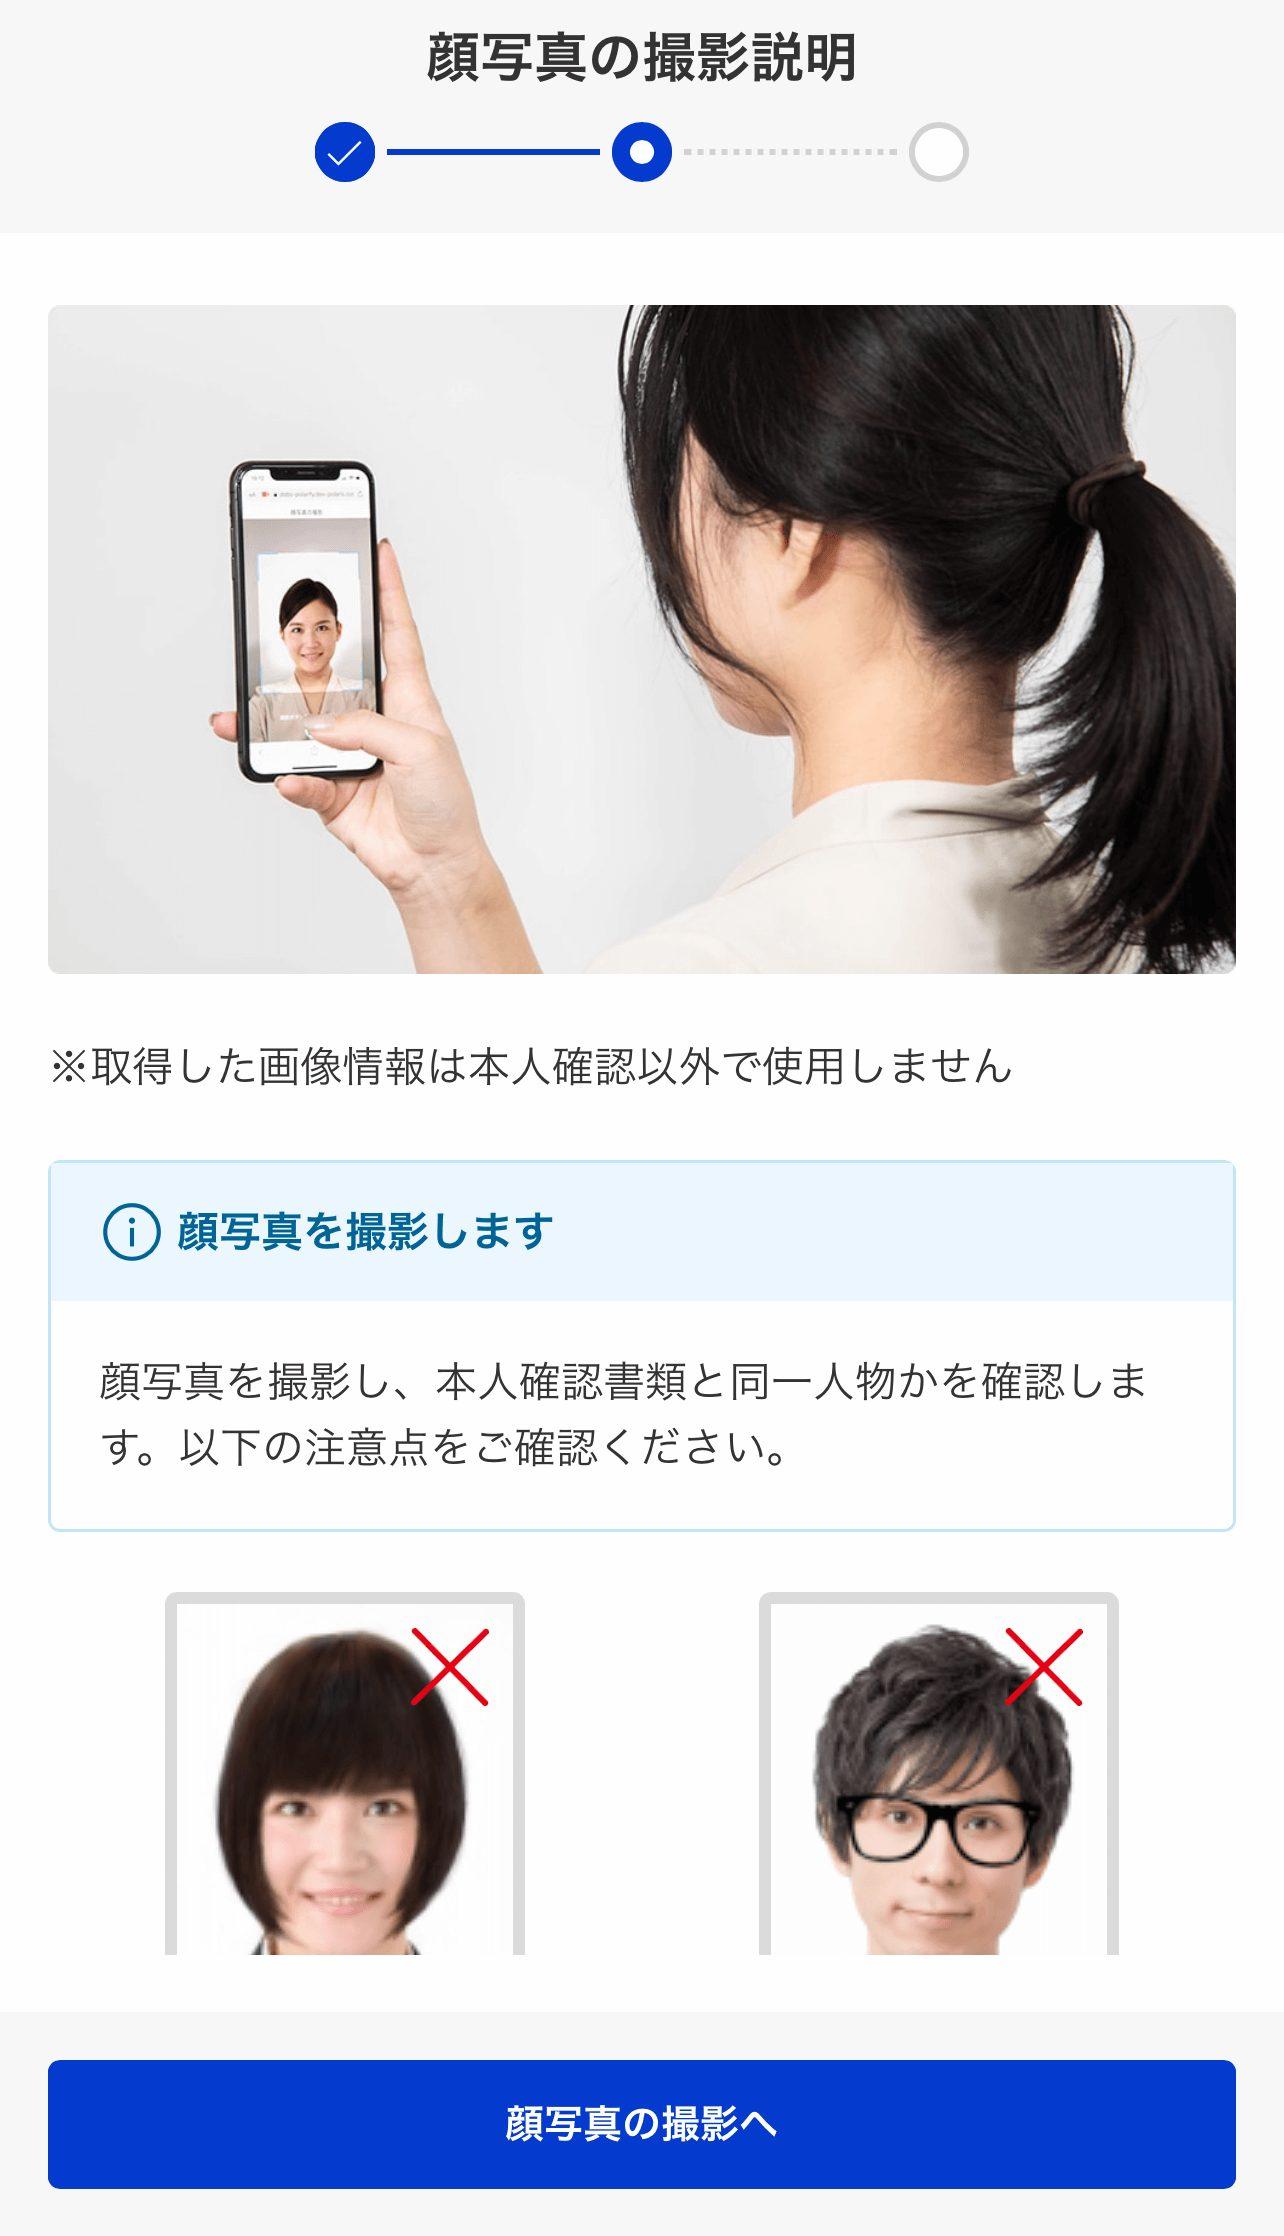 顔写真の撮影説明